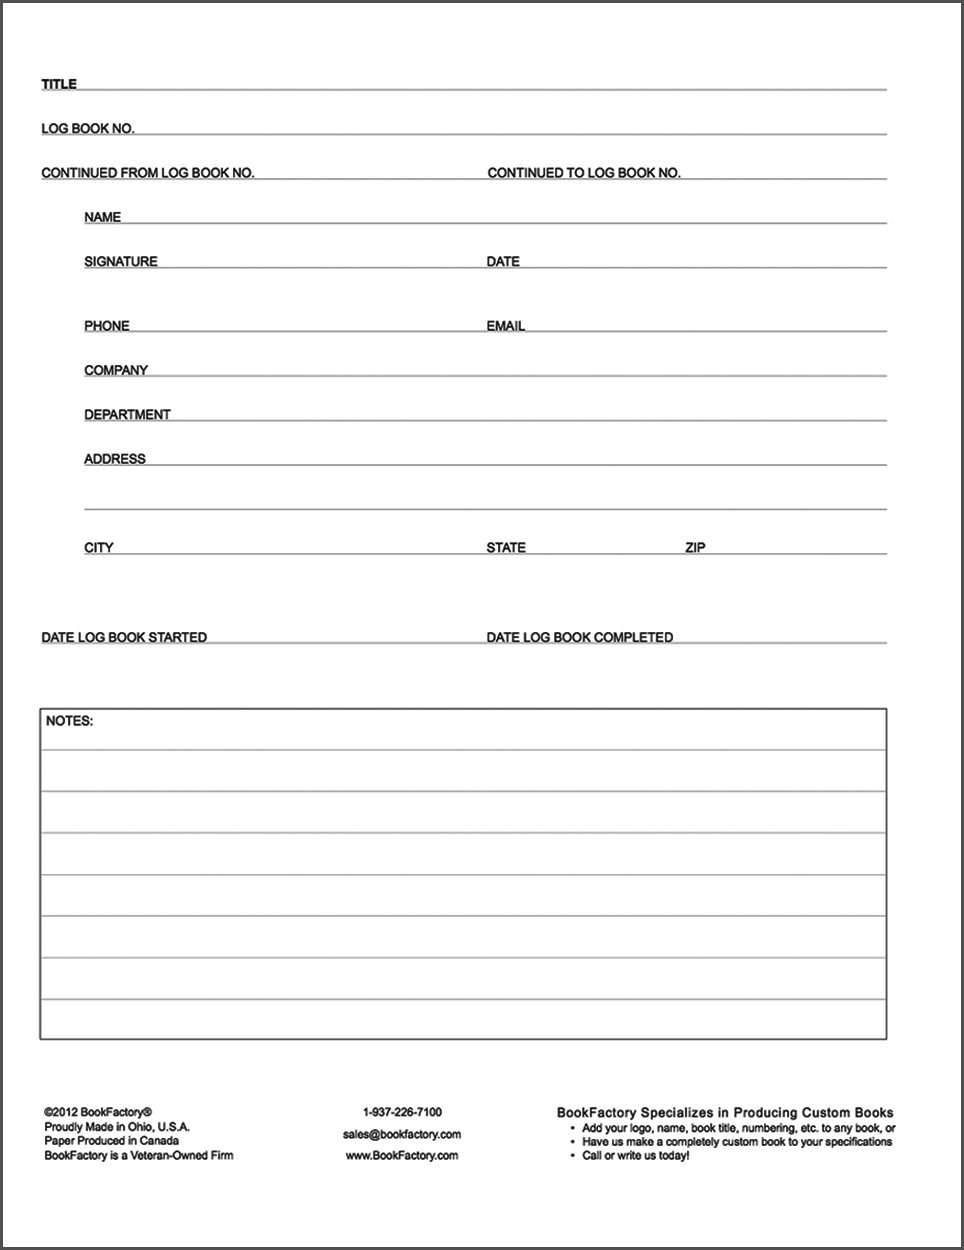 call log book